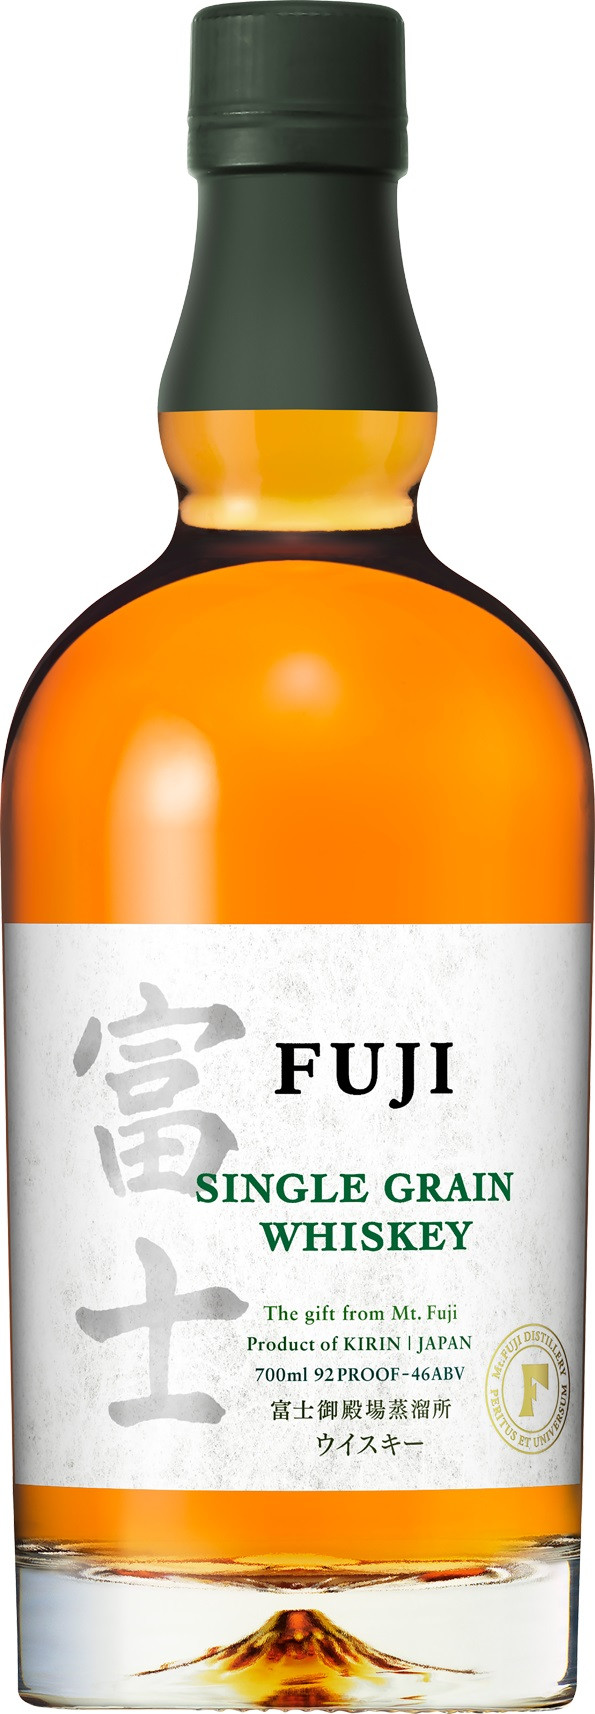 Fuji Single Grain Japanese Whisky 750ml